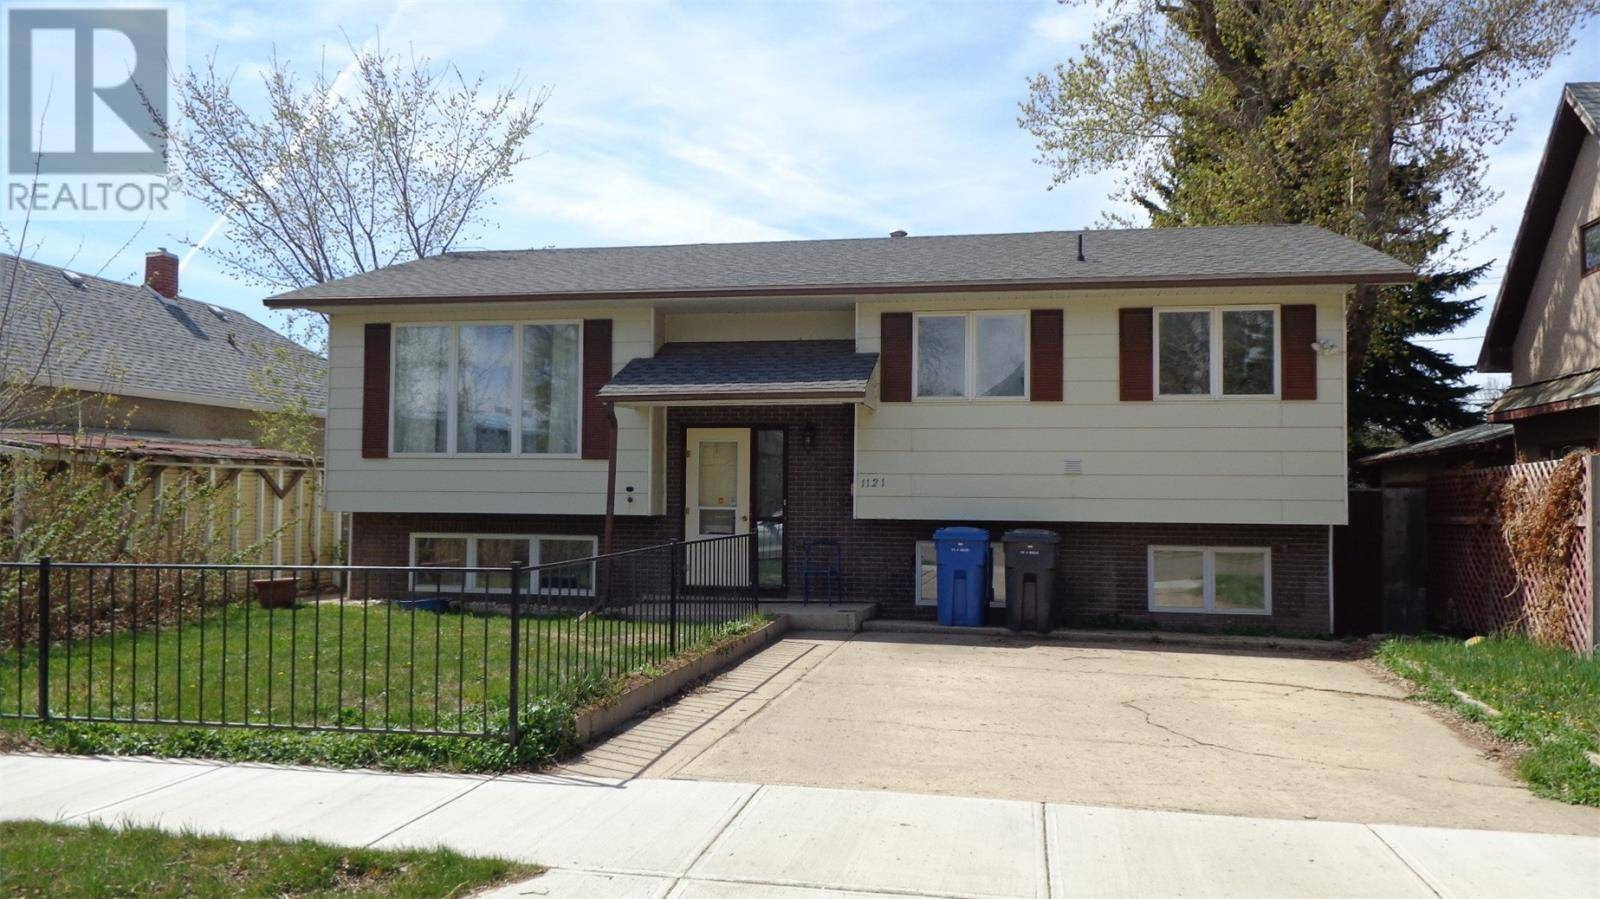 House for sale at 1121 105th St North Battleford Saskatchewan - MLS: SK772975